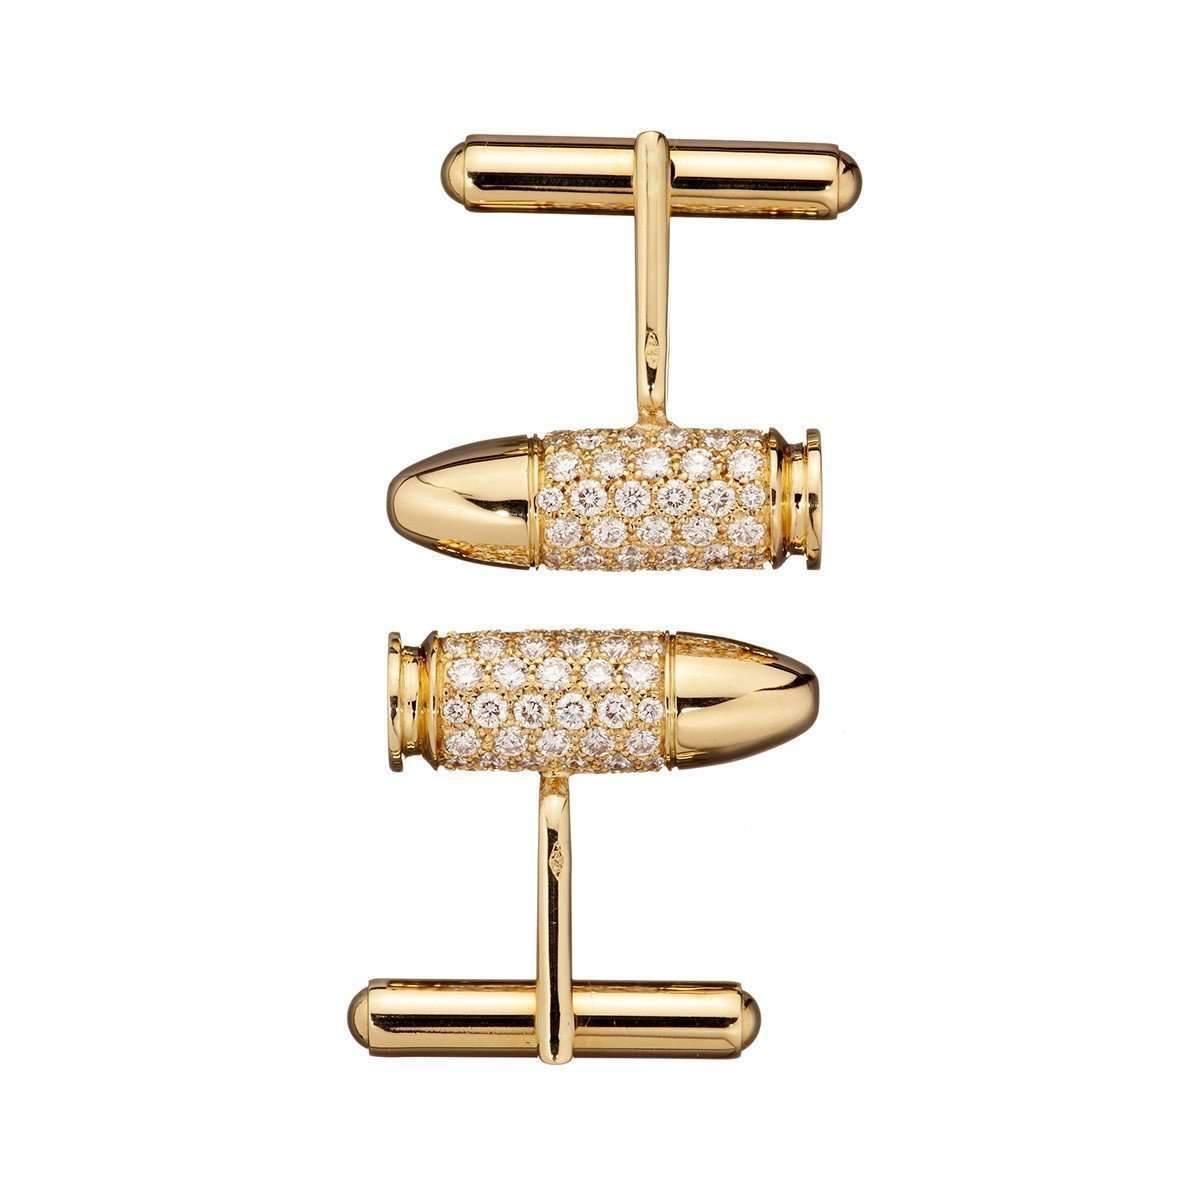 Akillis Bang Bang Yellow Gold Diamond Cufflinks byBiIXI8S0